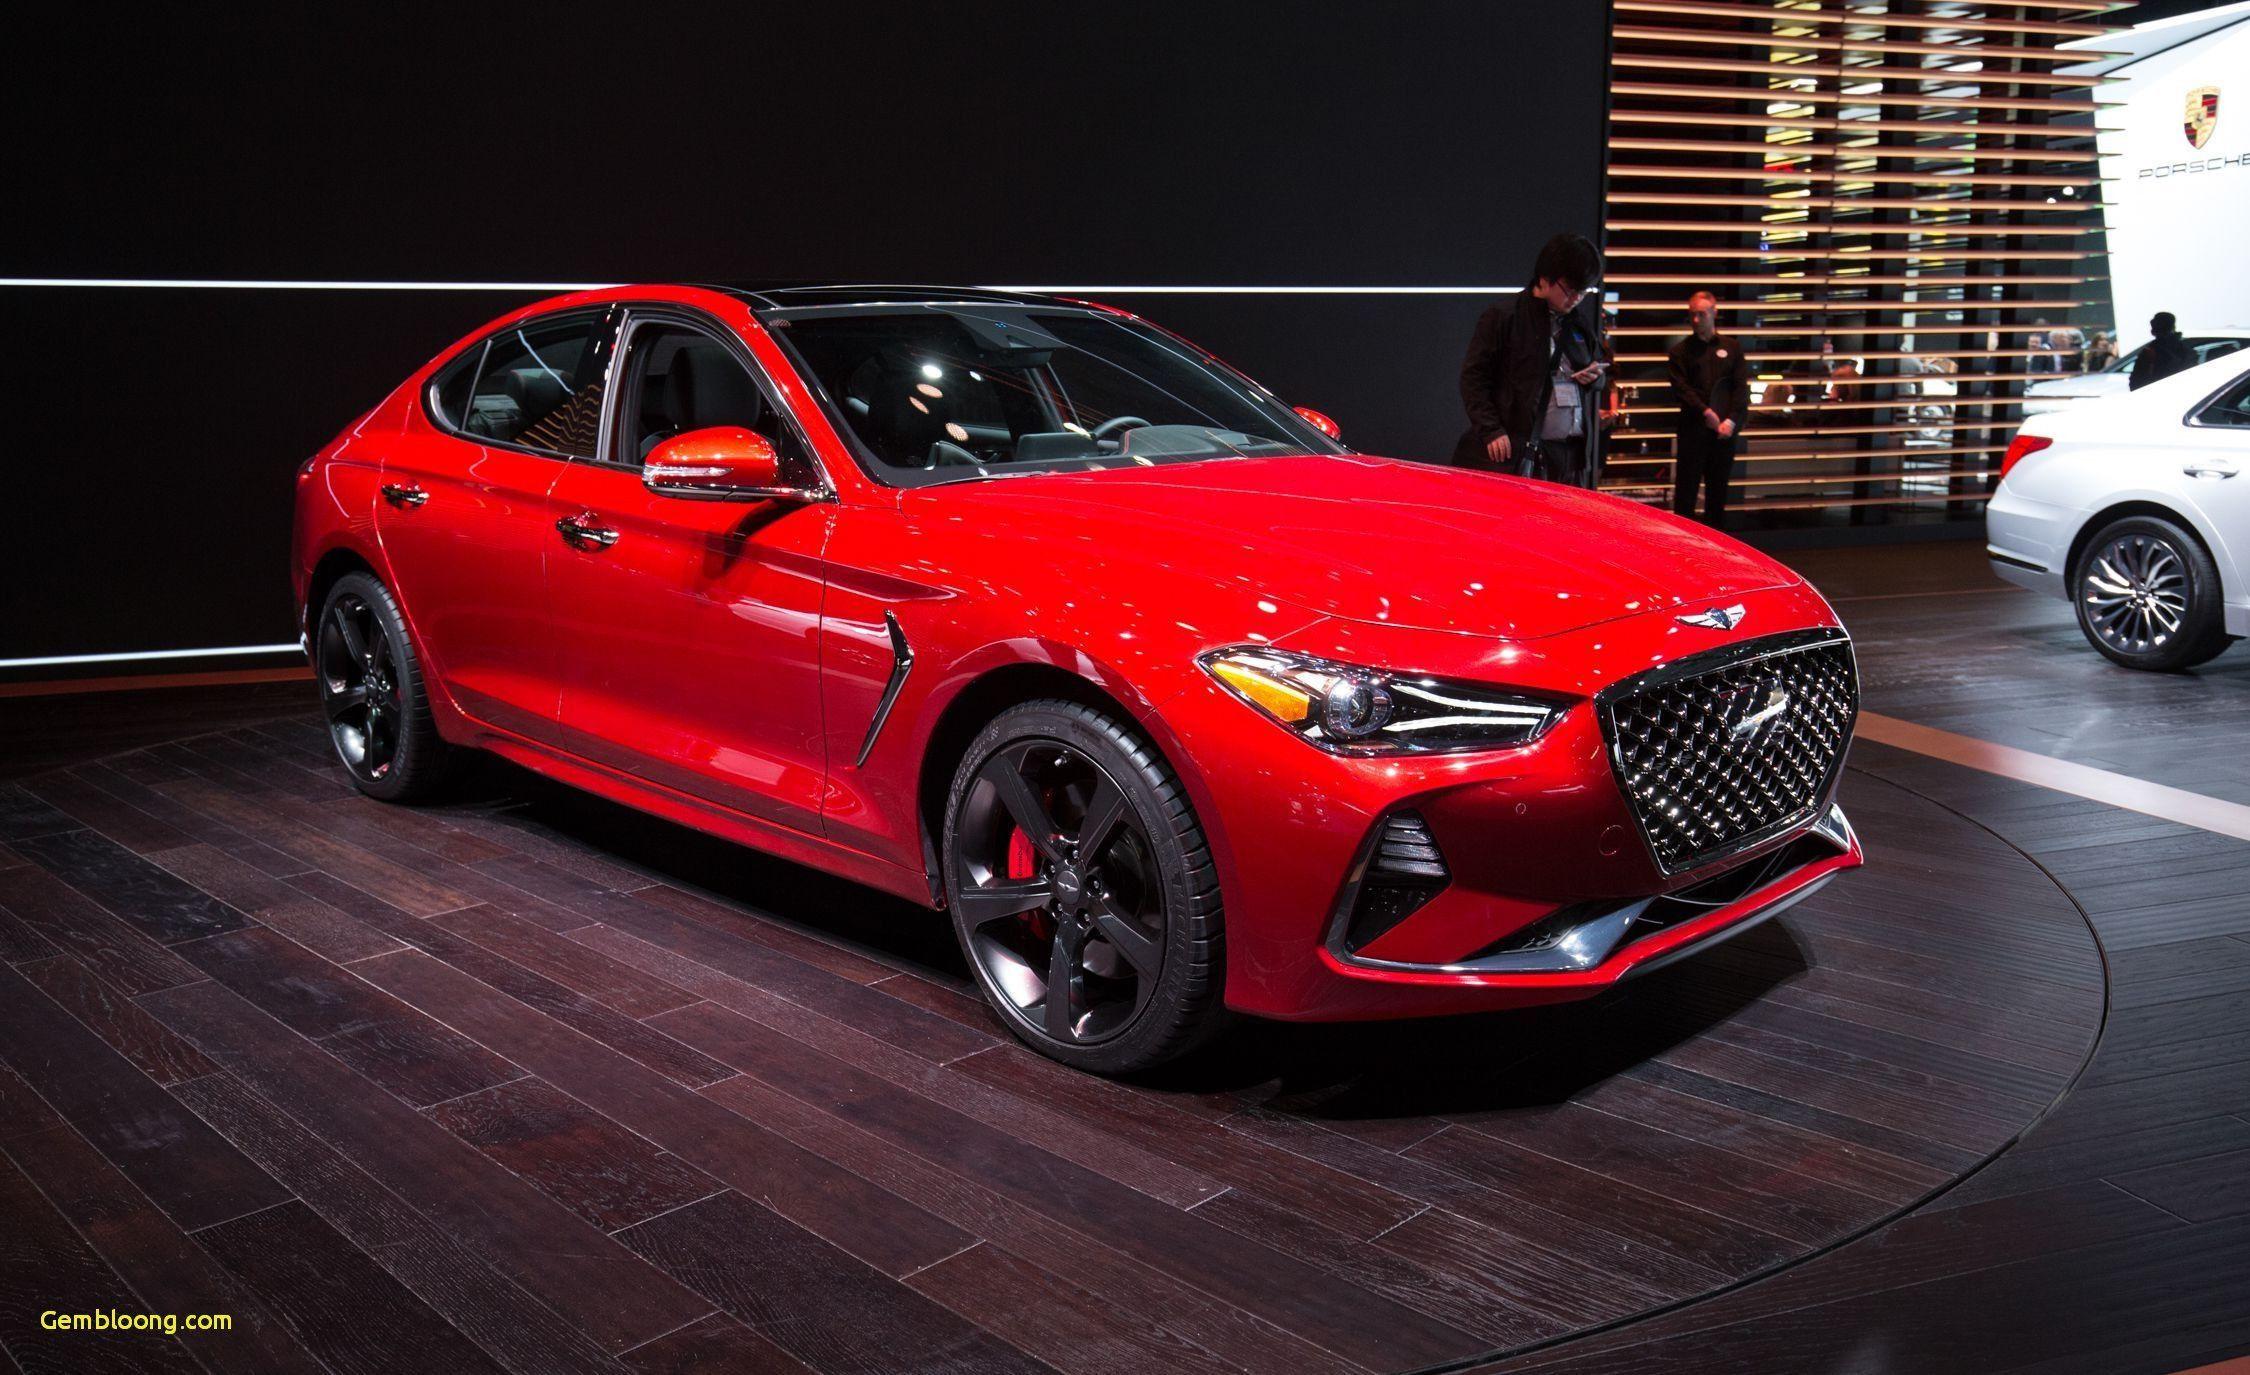 2020 Genesis Coupe 2020 Genesis Coupe, 2020 genesis